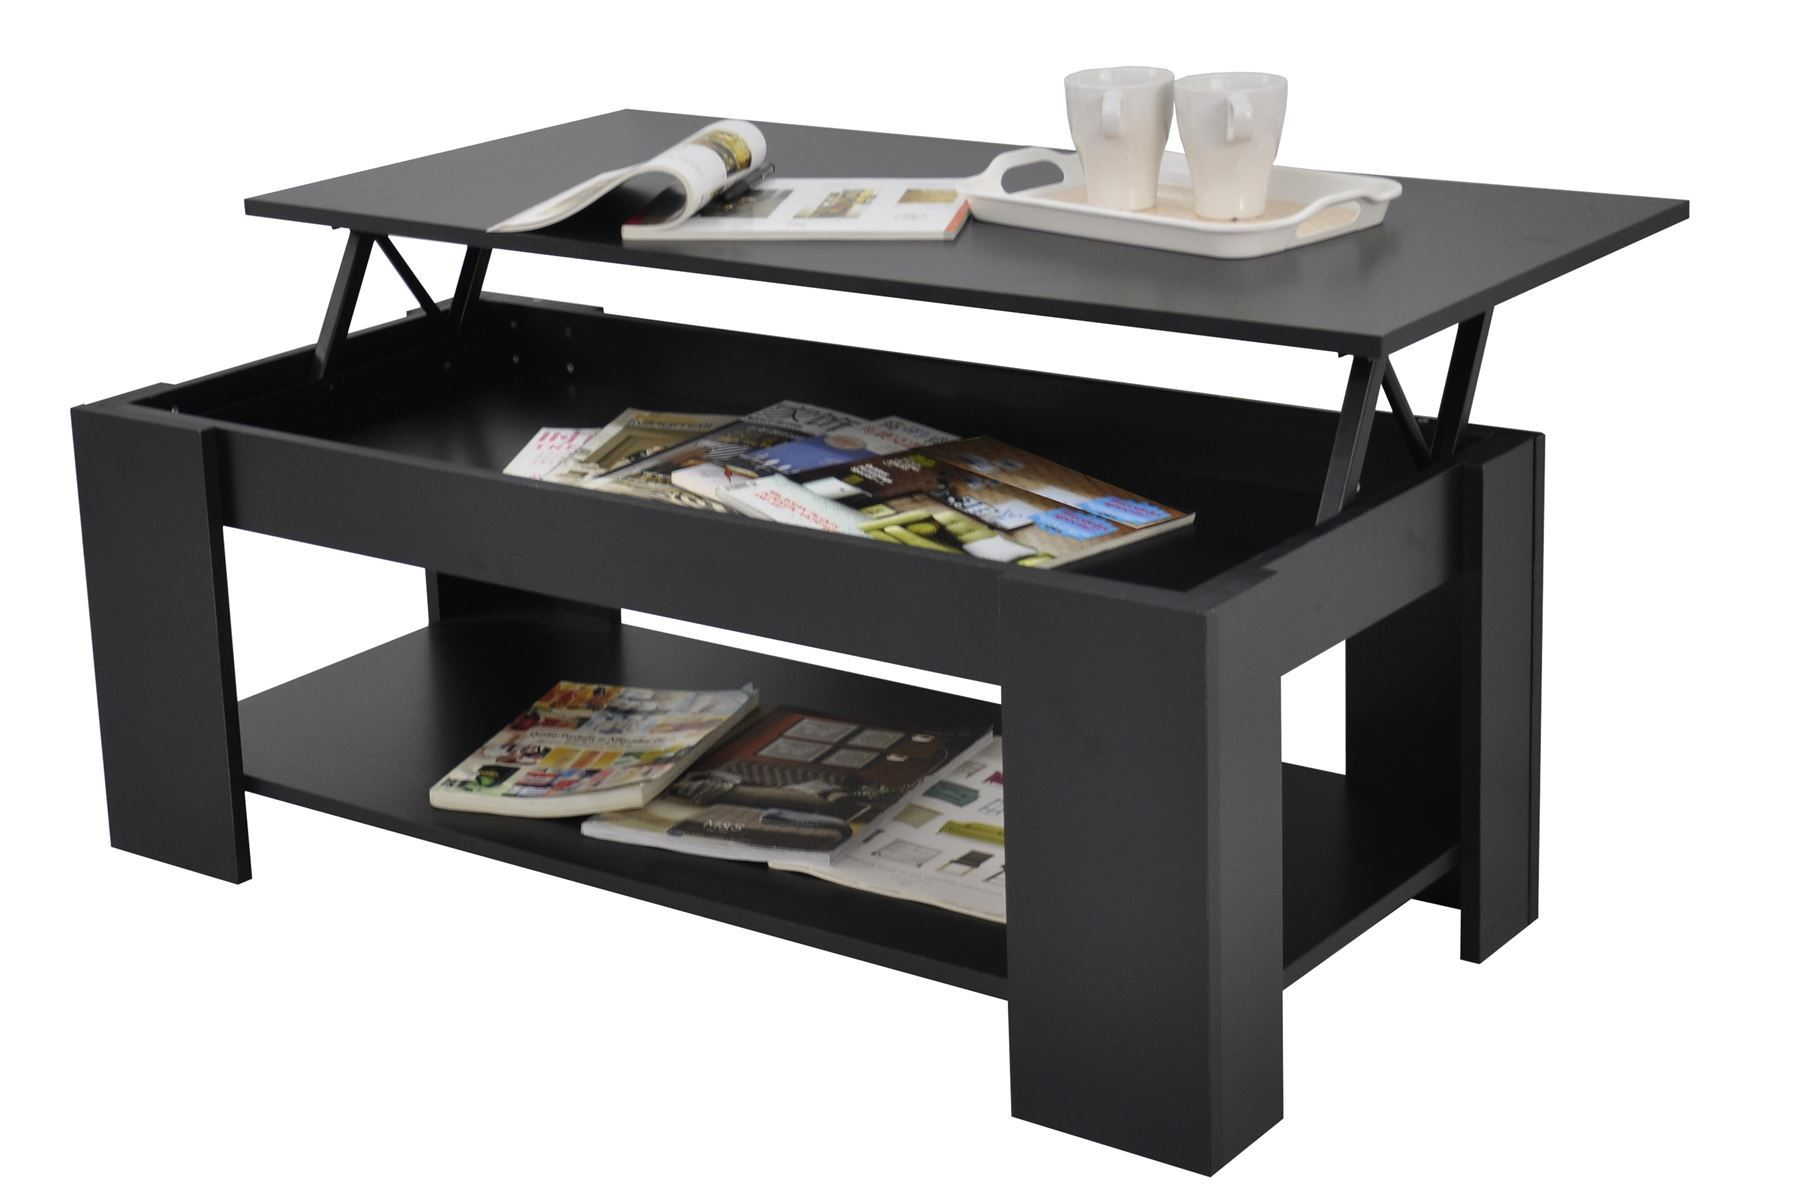 Stephanie Storage Large Solid Lift Up Coffee Table Black Shelf Modern Ebay